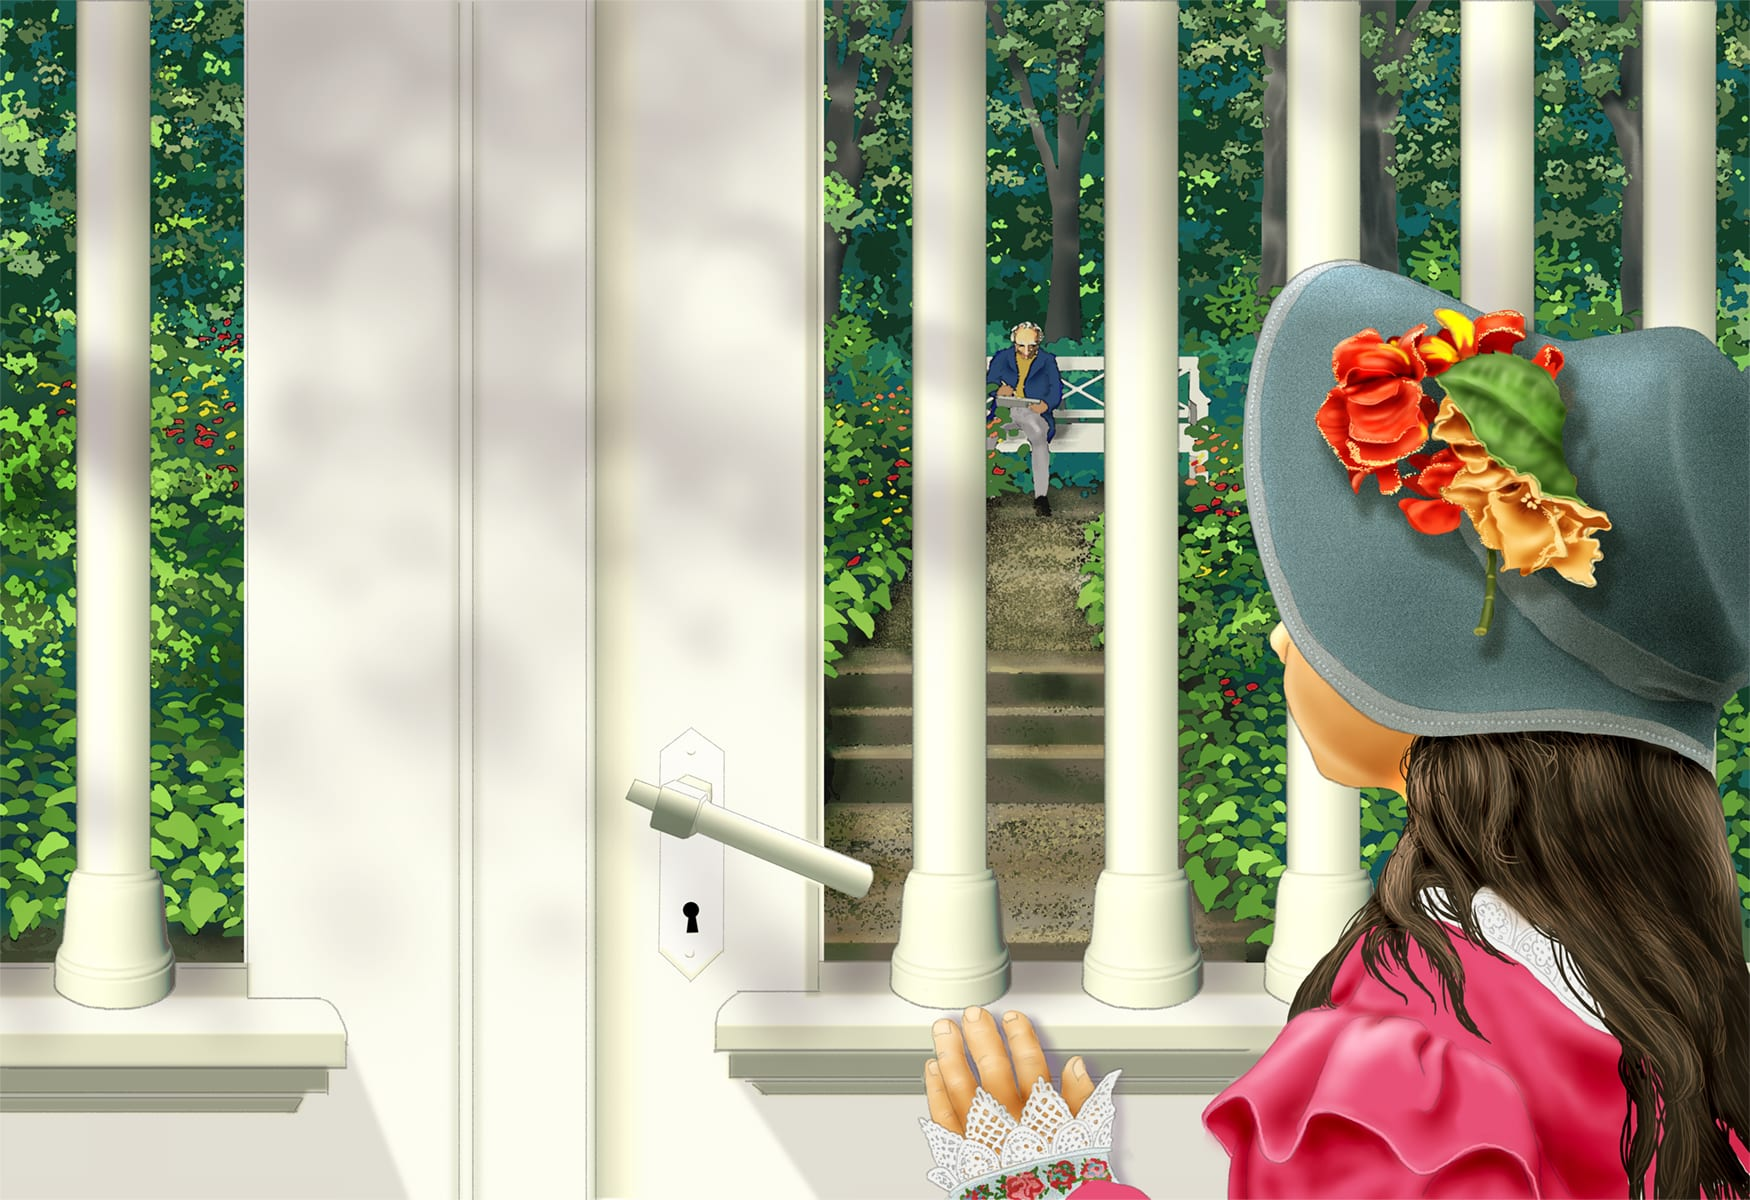 Anna at the garden gate